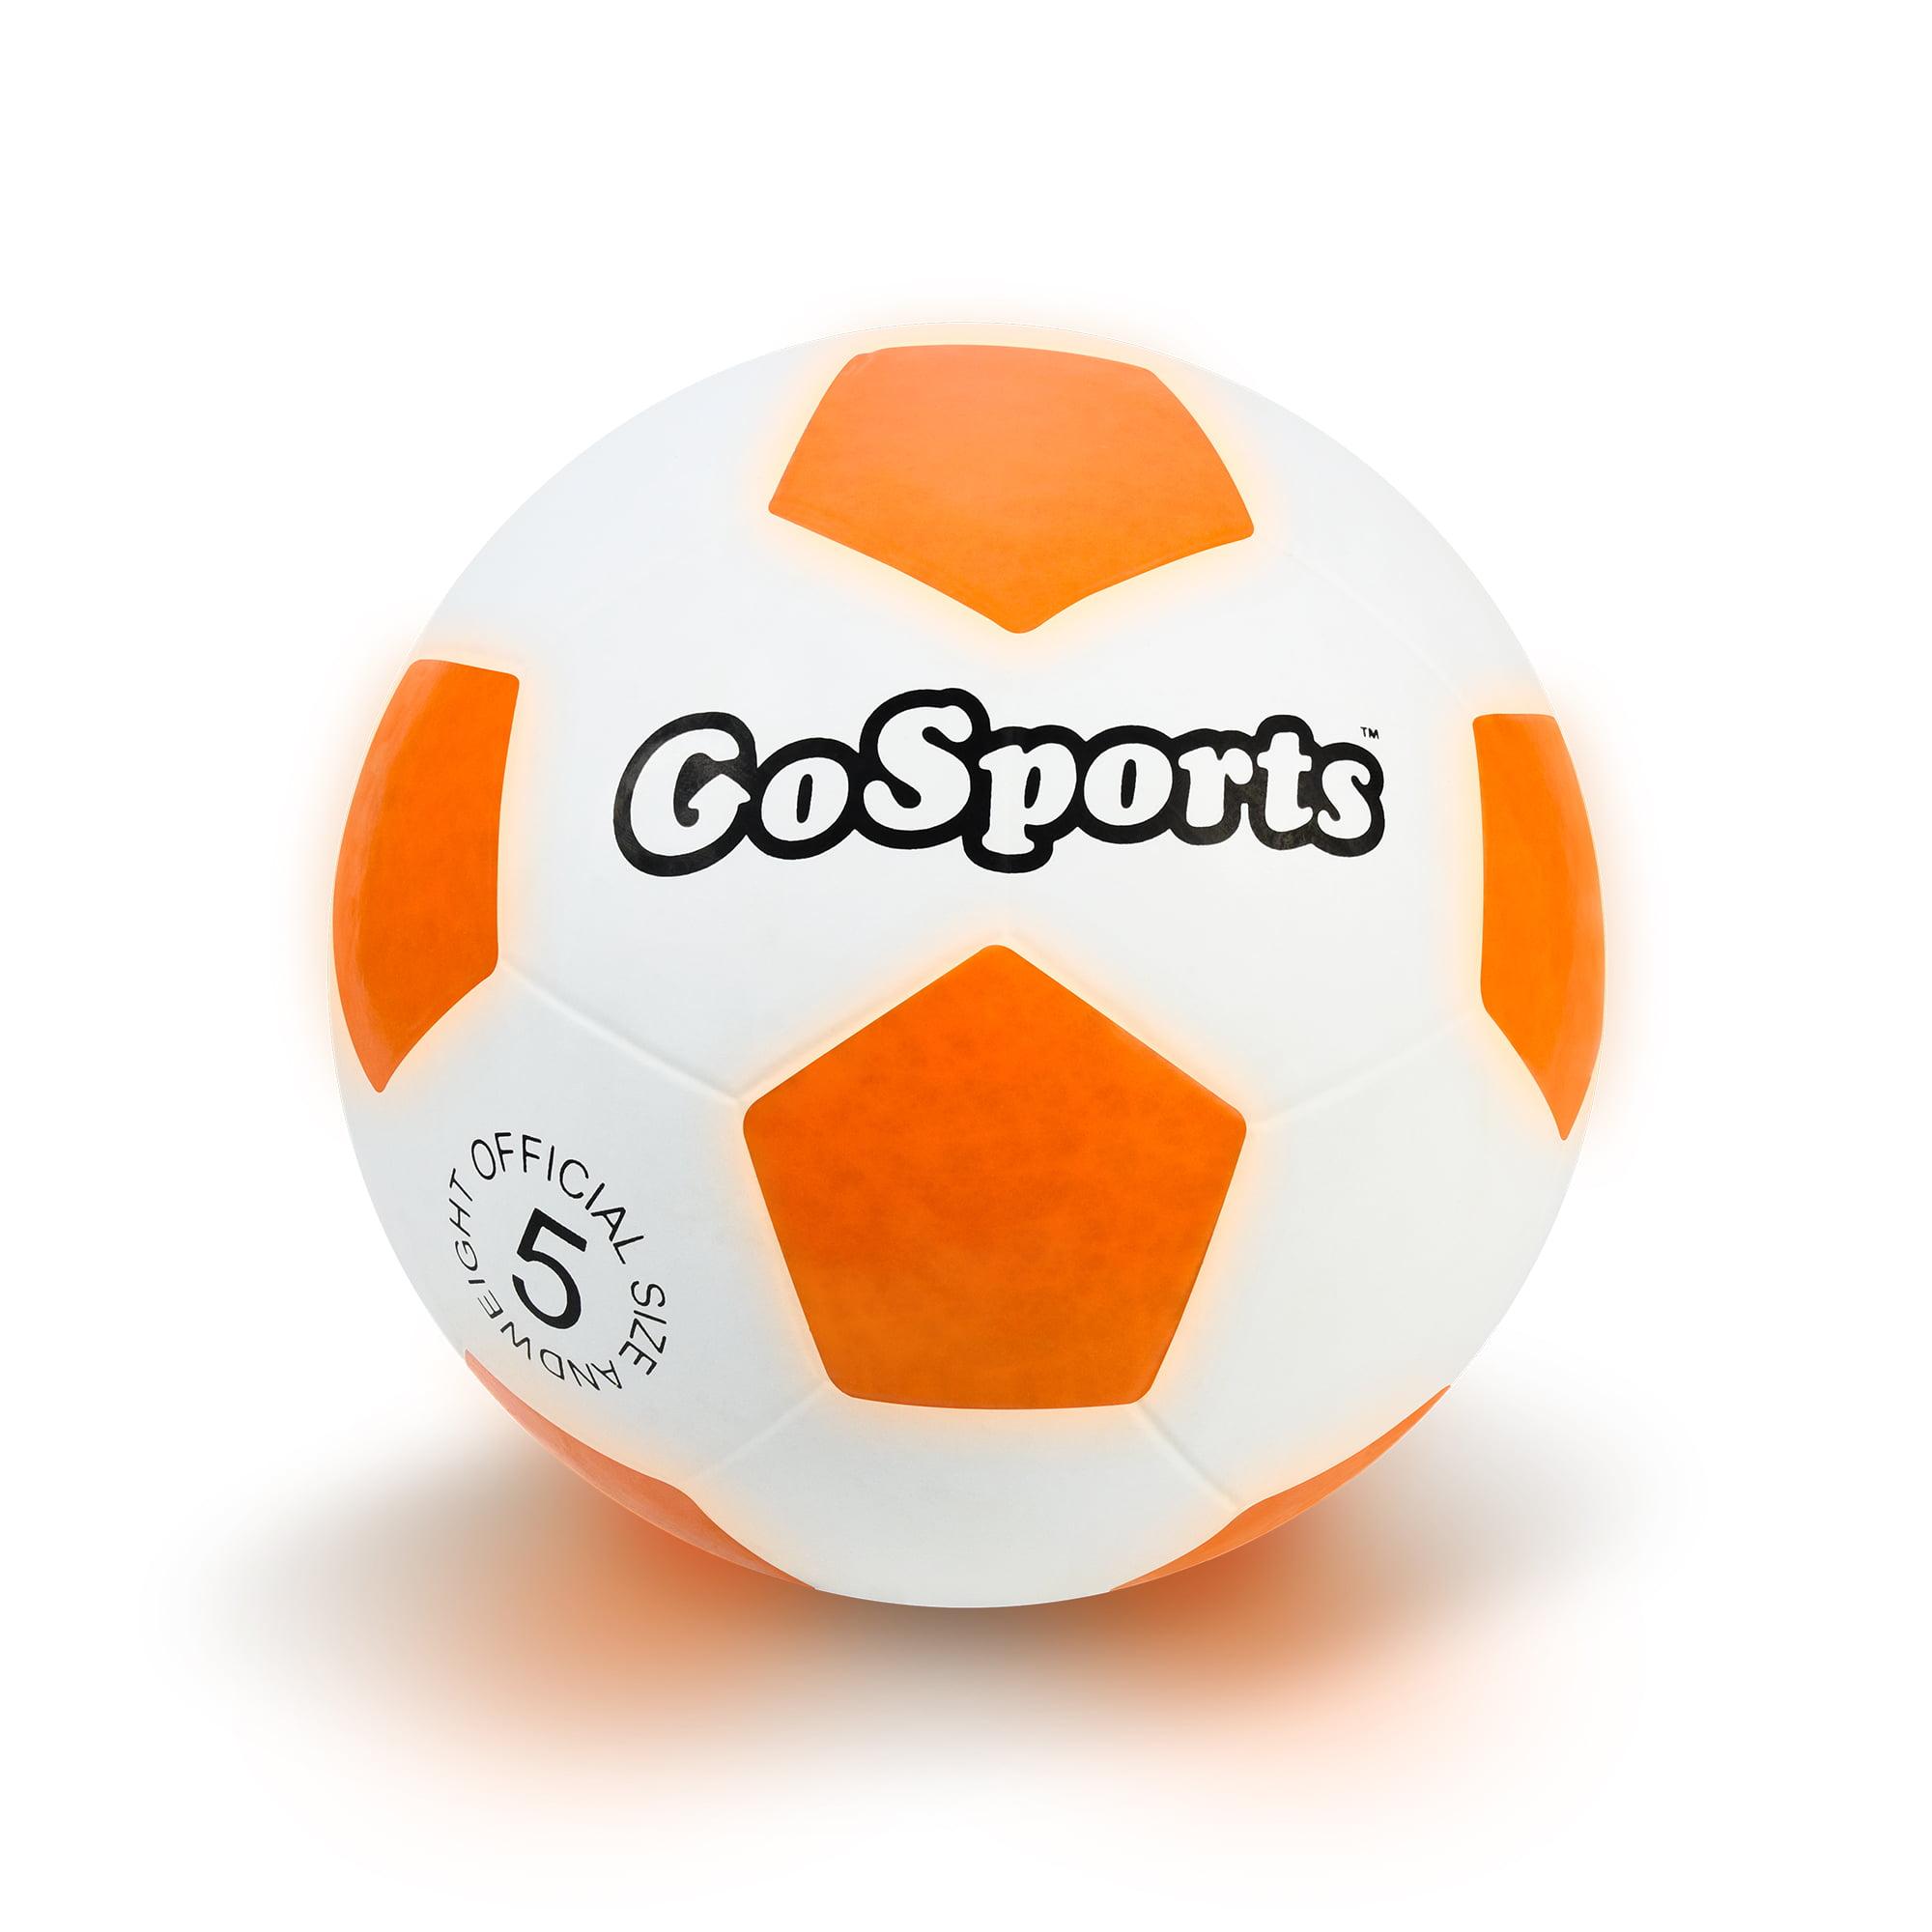 GoSports LED Light Up Soccer Ball by P&P Imports LLC